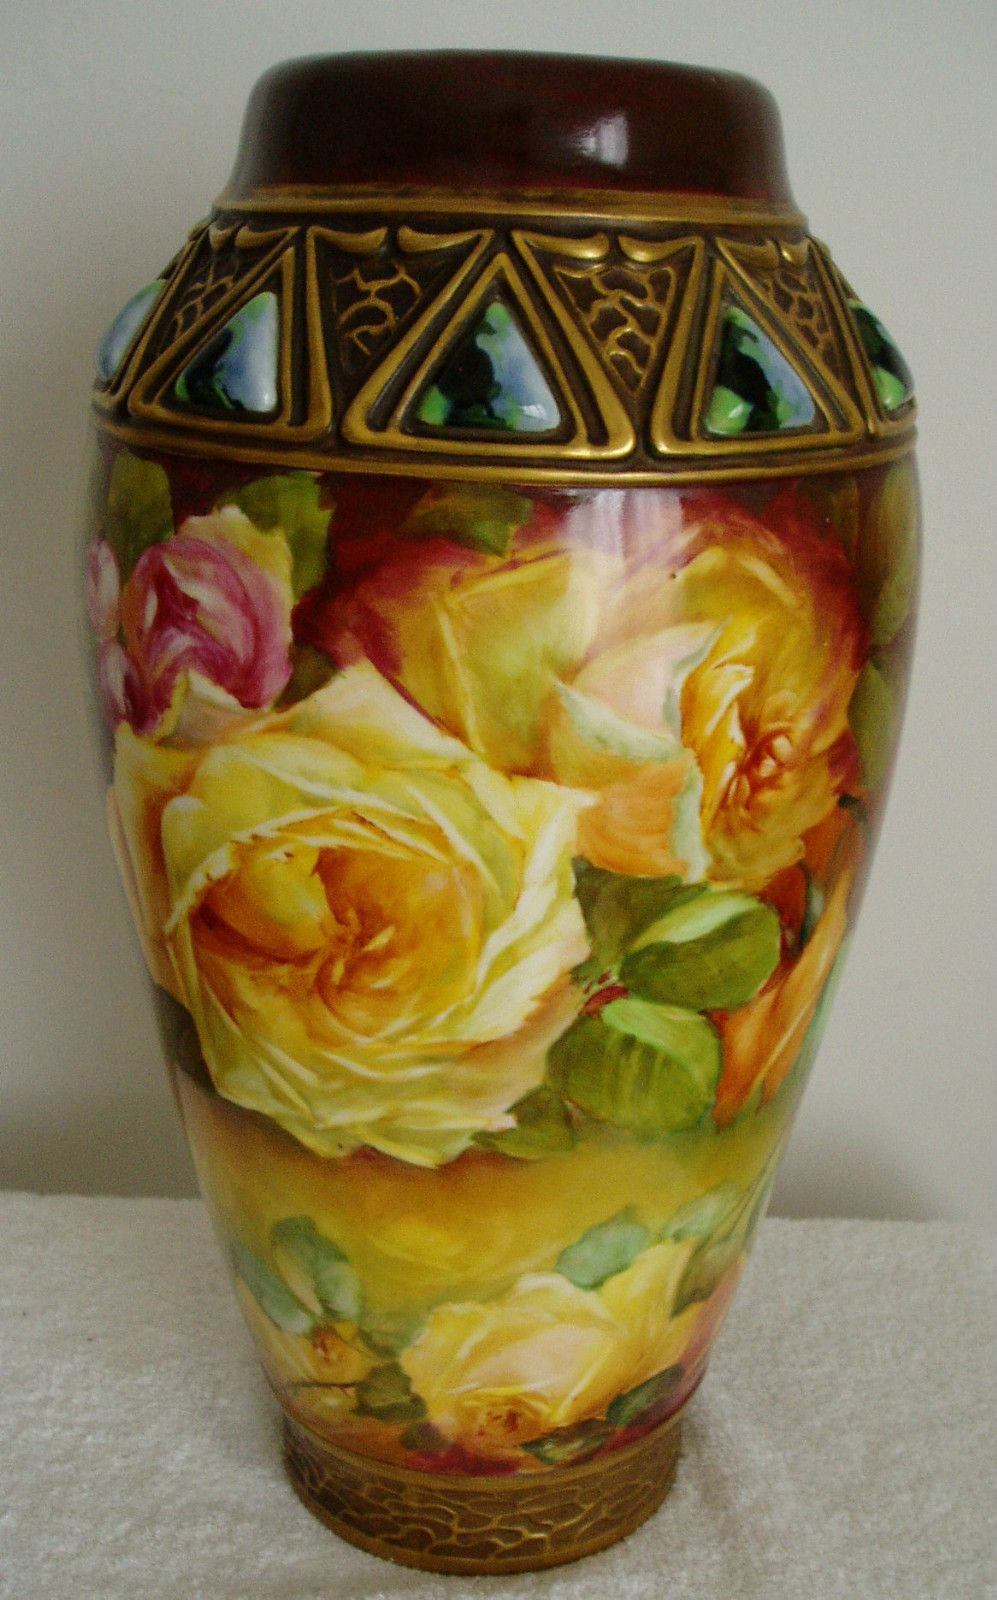 antique ceramic vases of habsburg austria vintage large art pottery vase hand painted roses within habsburg austria vintage large art pottery vase hand painted roses ebay